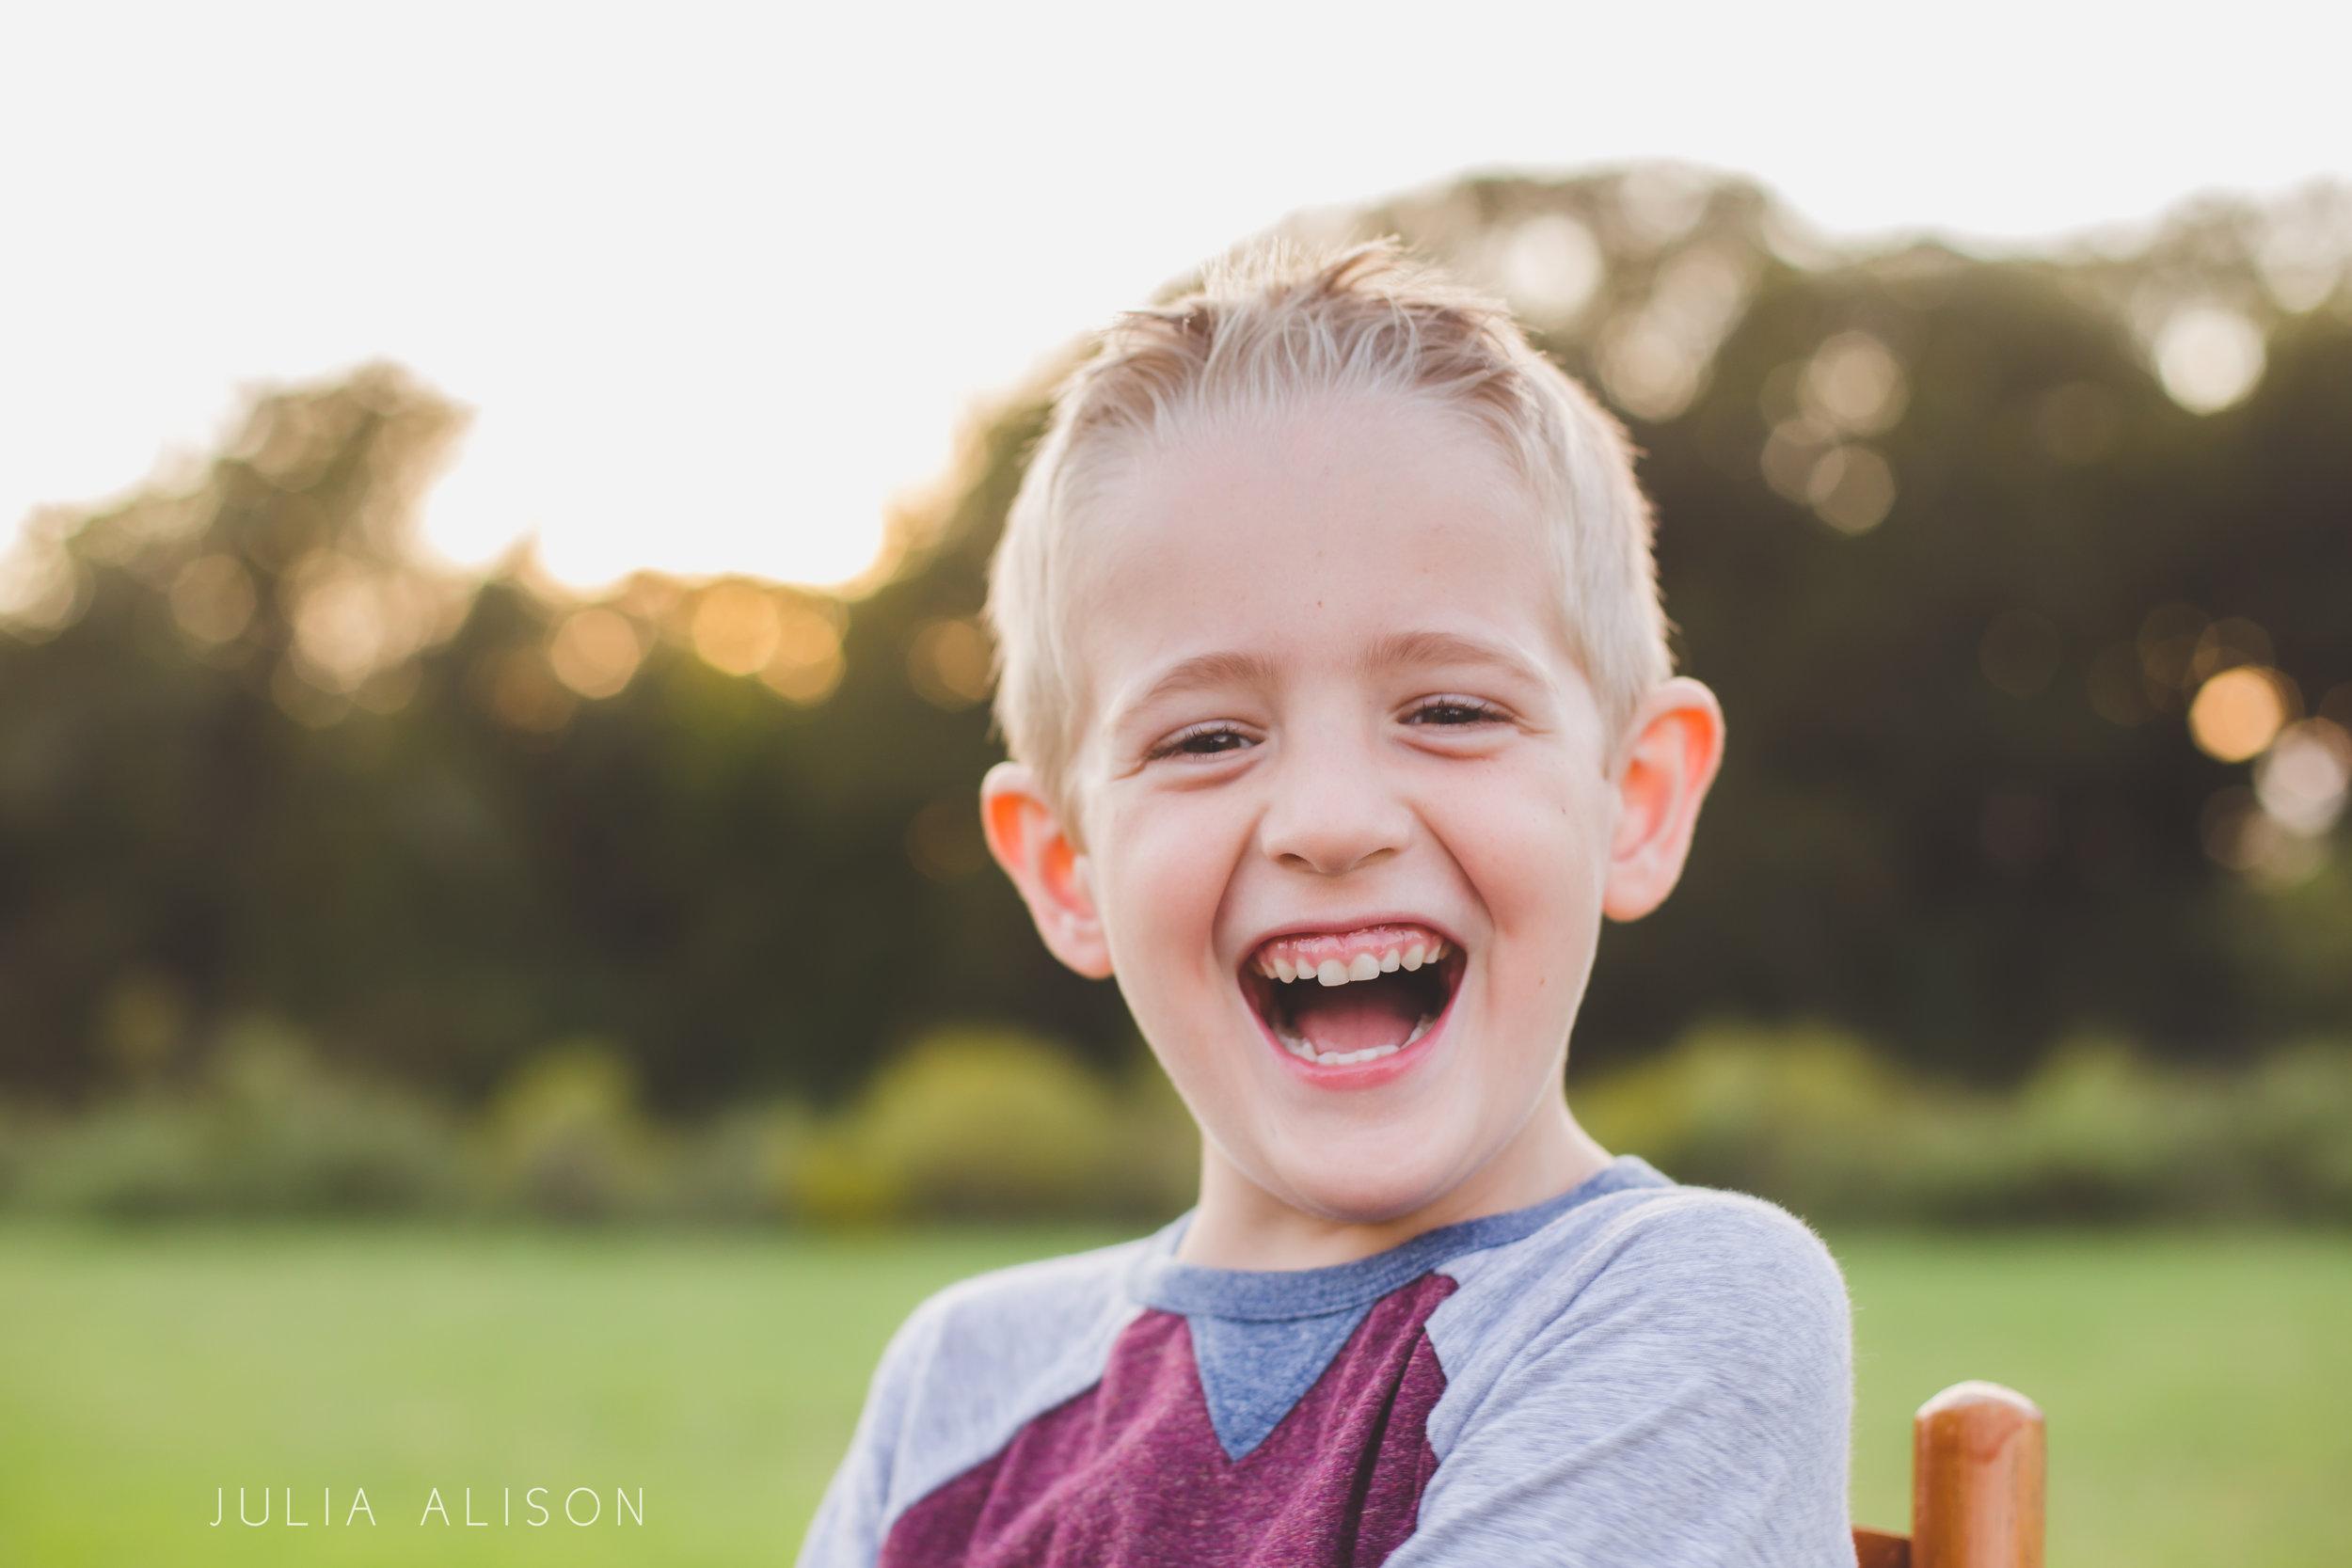 denton tx child photographer 1.jpg